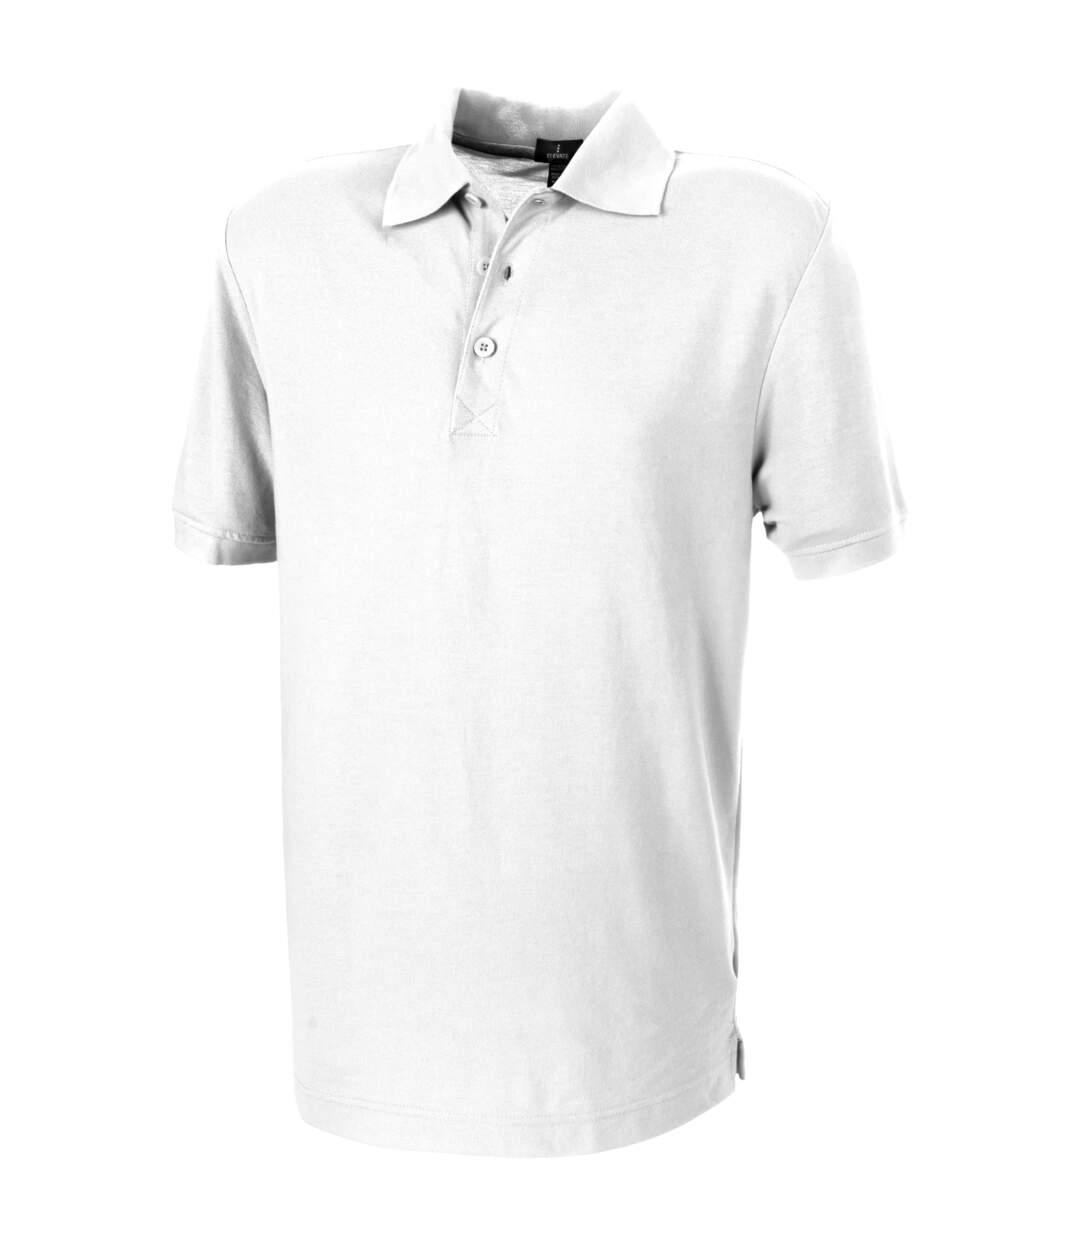 Elevate Crandall Short Sleeve Polo (White) - UTPF1831